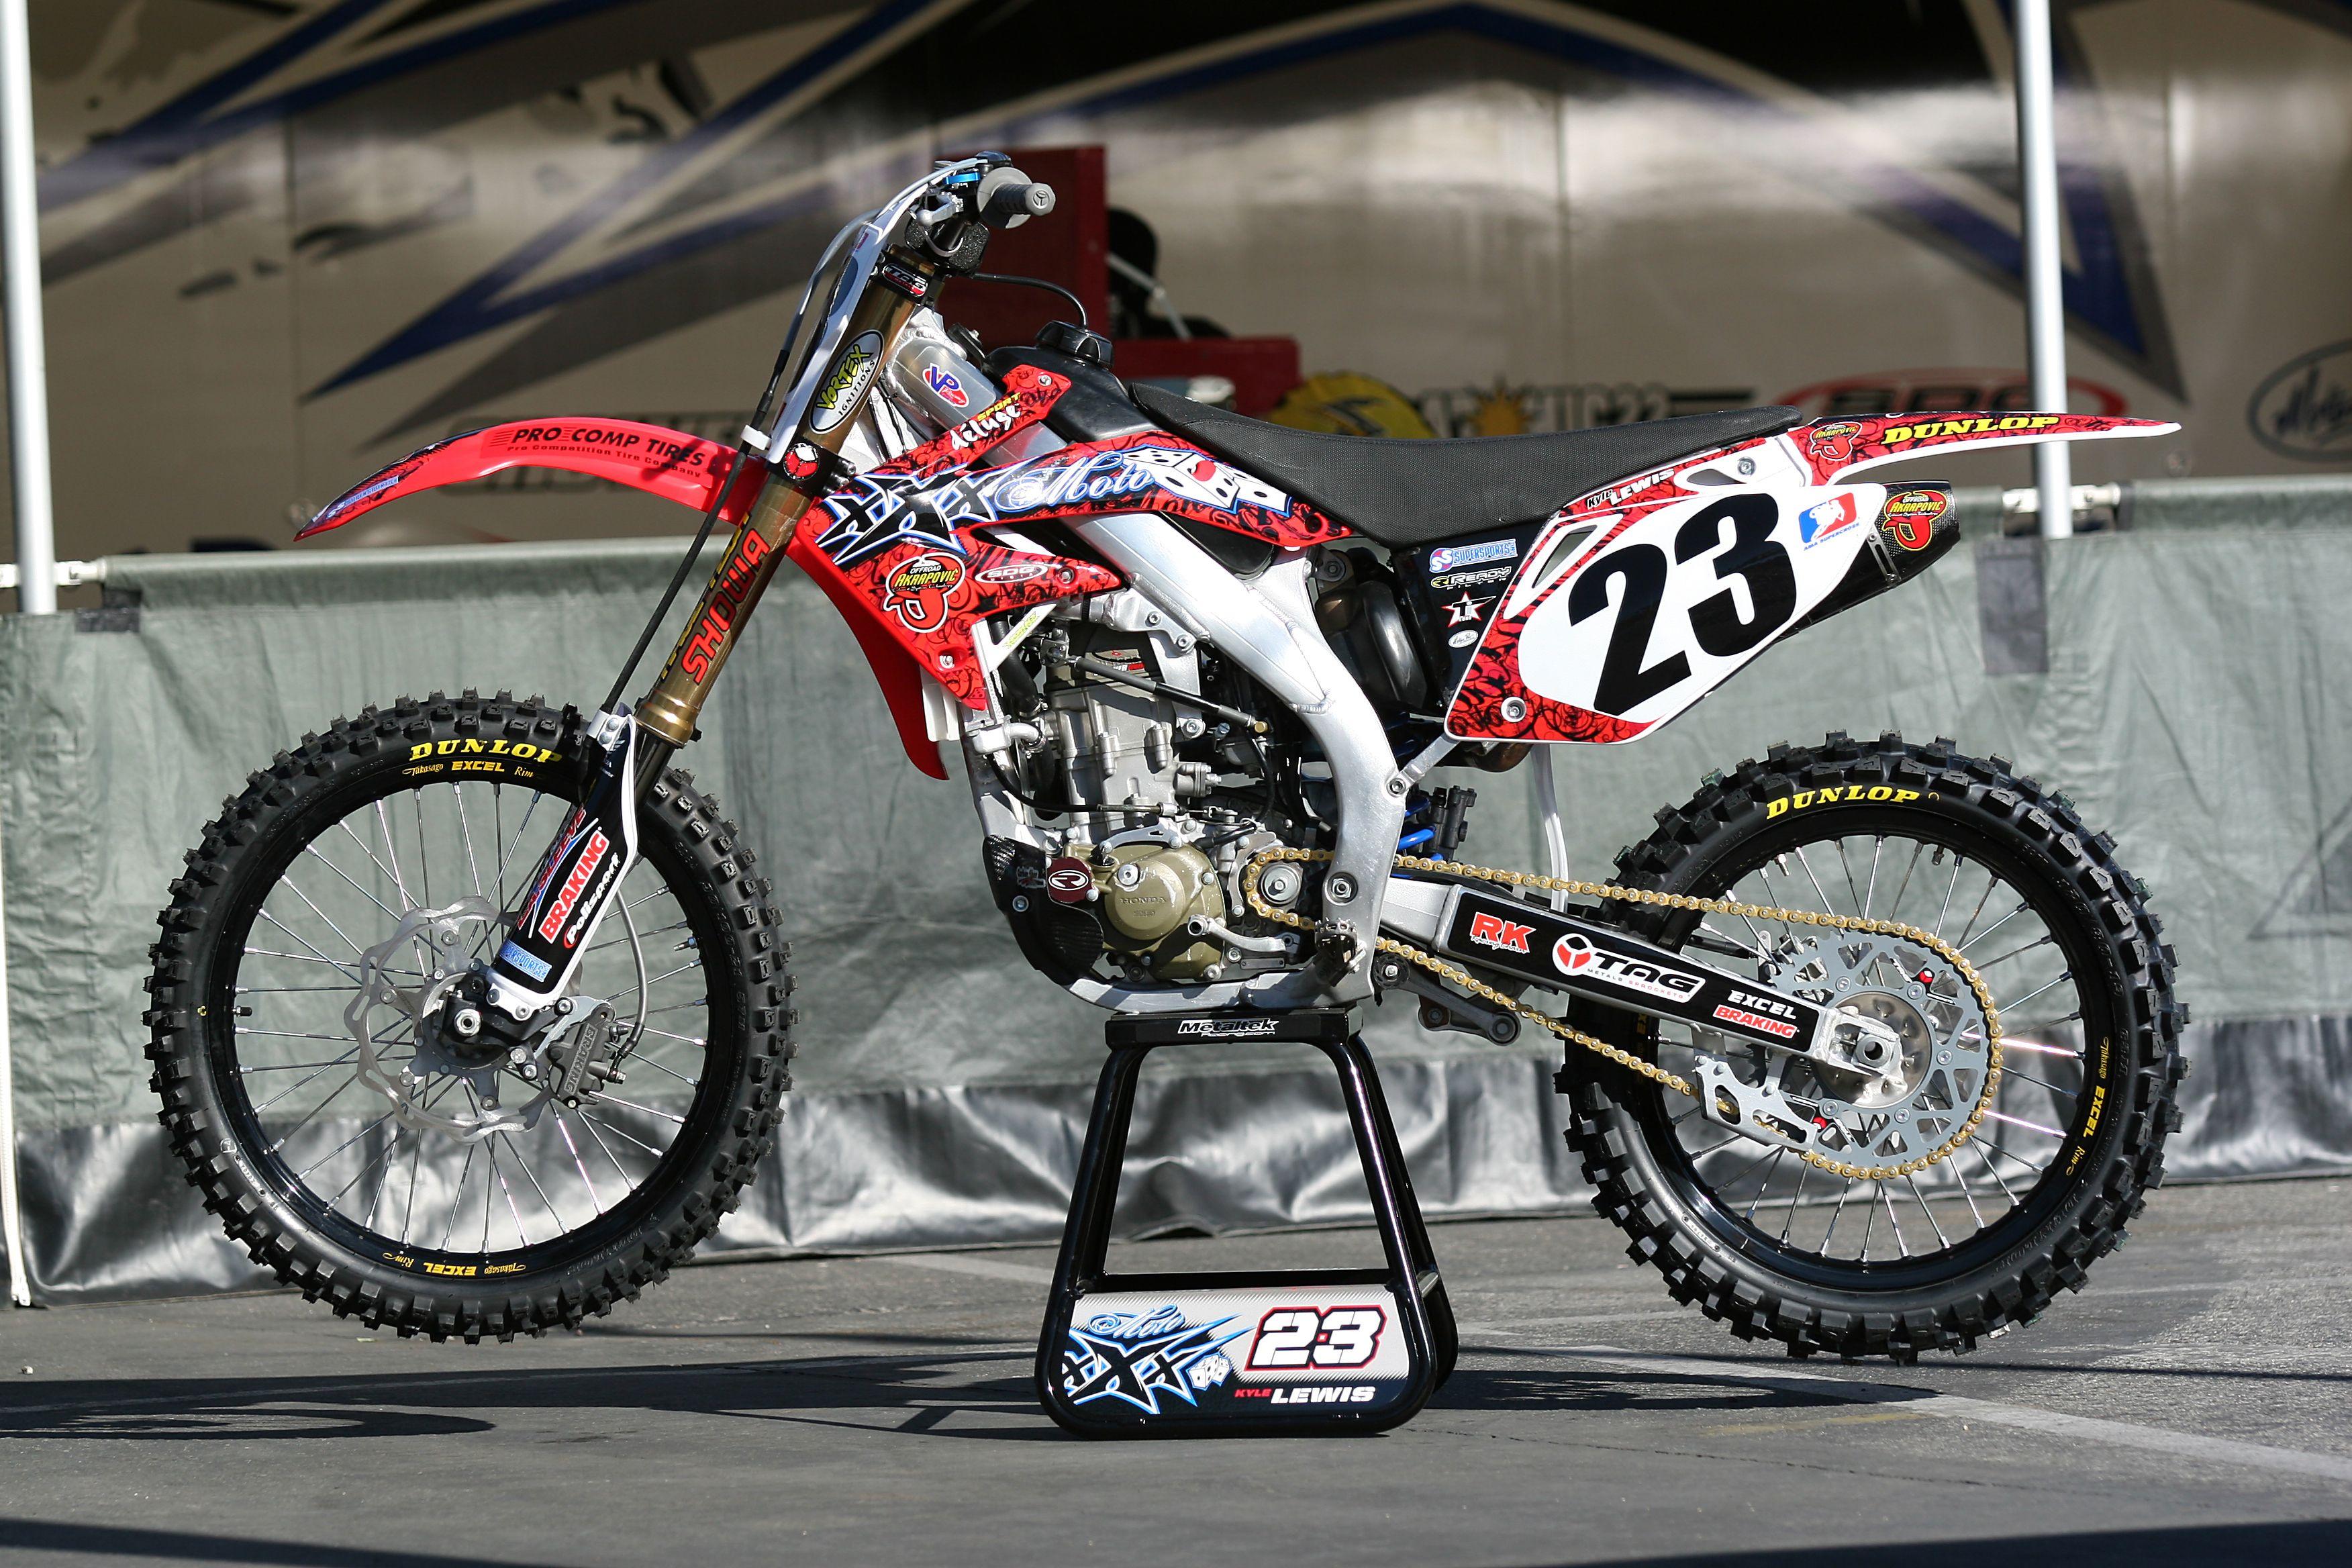 Crf 450cc Motocross Motocross Dirtbikes Motorcross